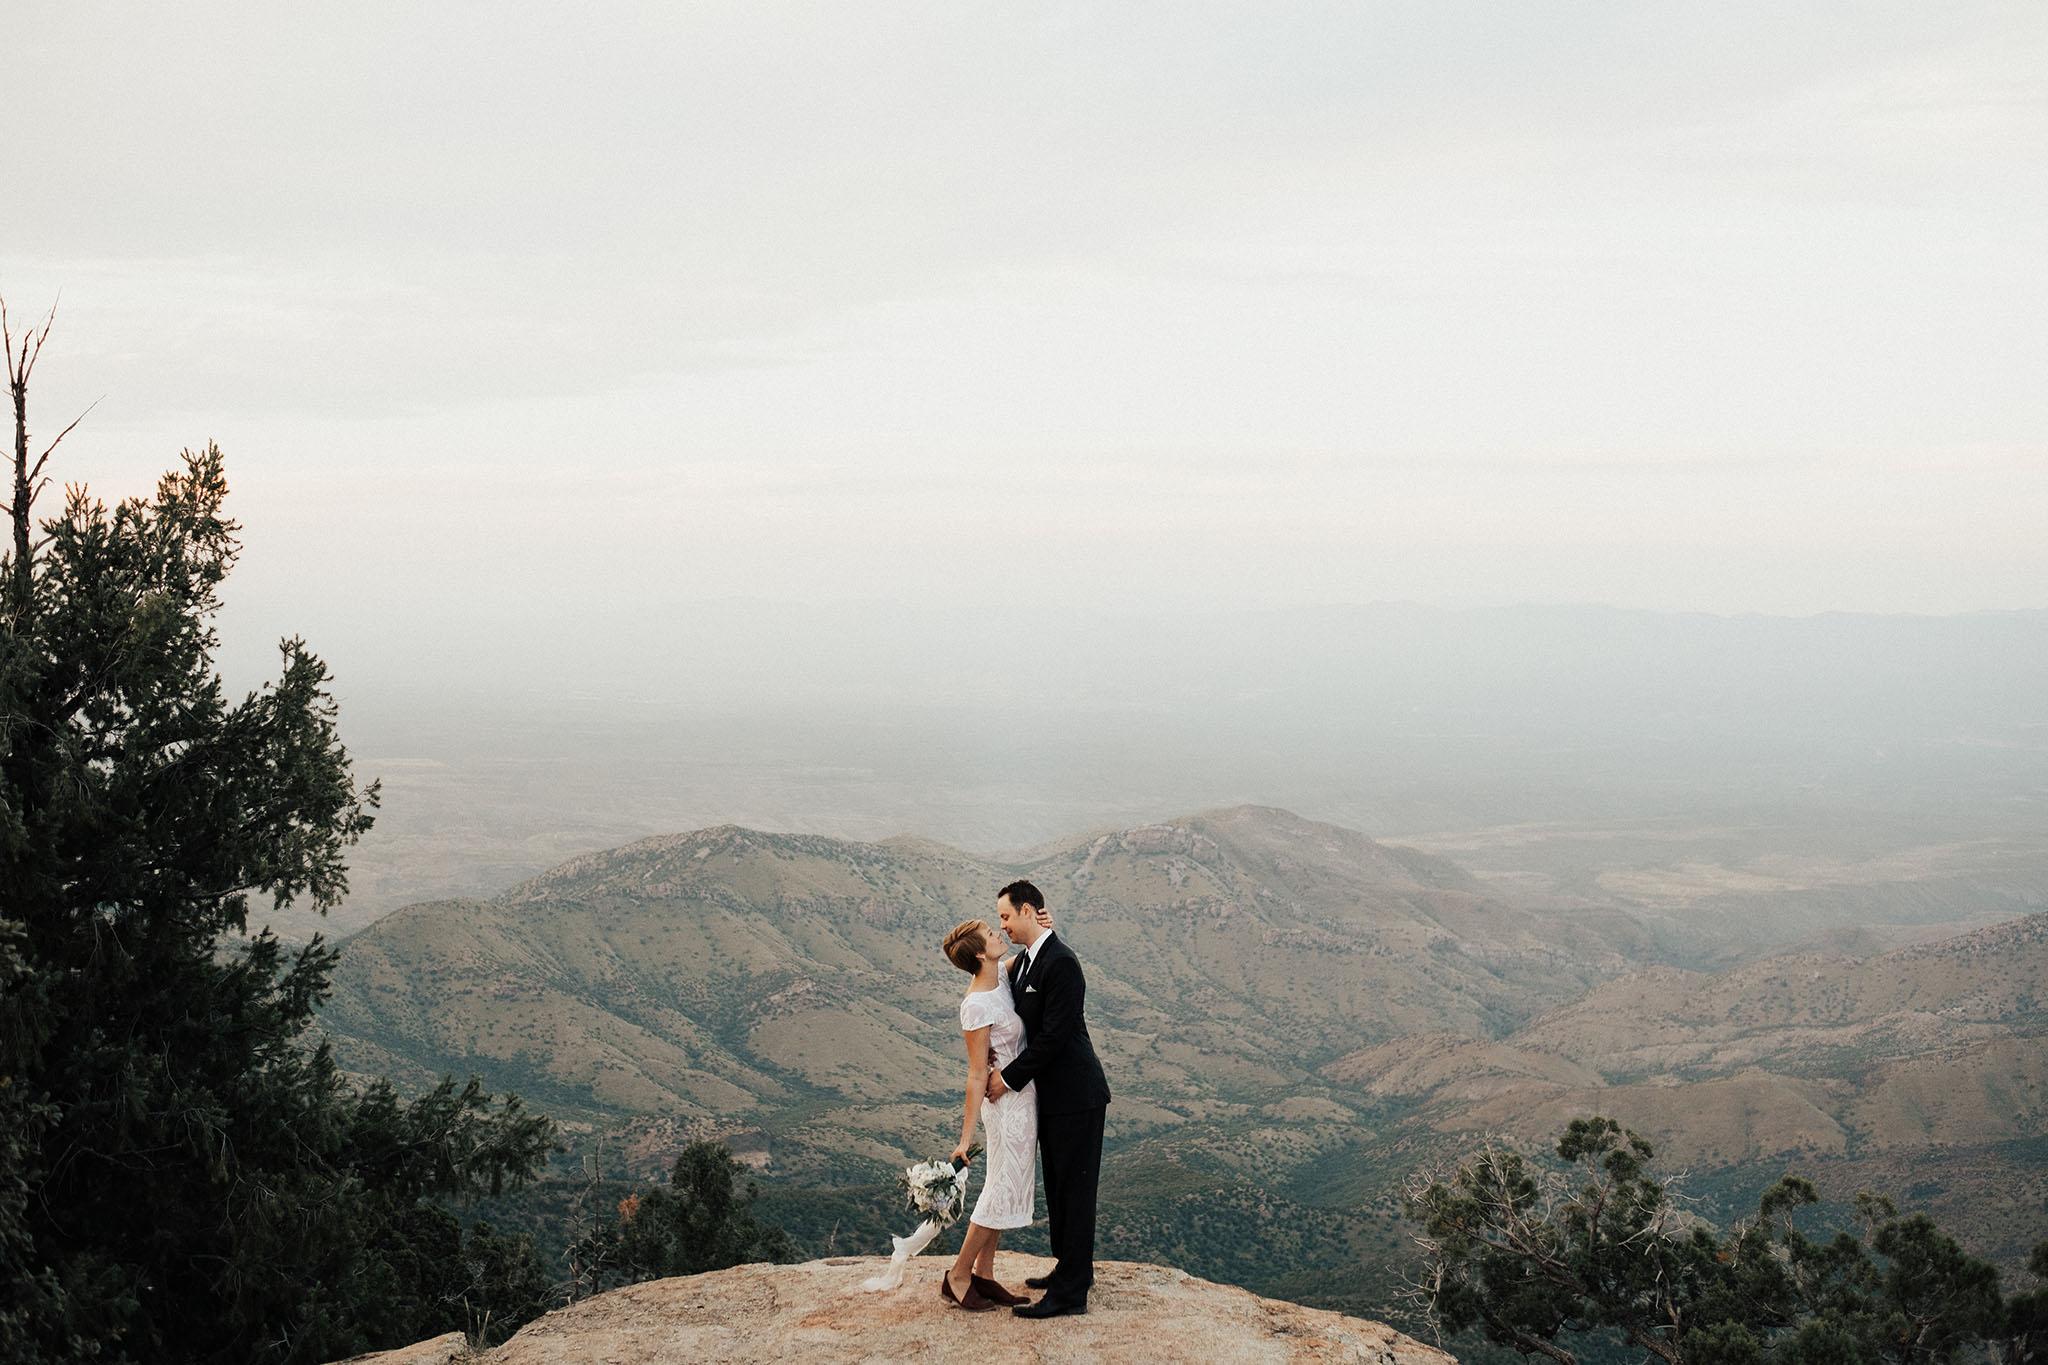 Arizona-Intimate-Elopement-Adventure-Photographer-Mount-Lemmon (32).jpg